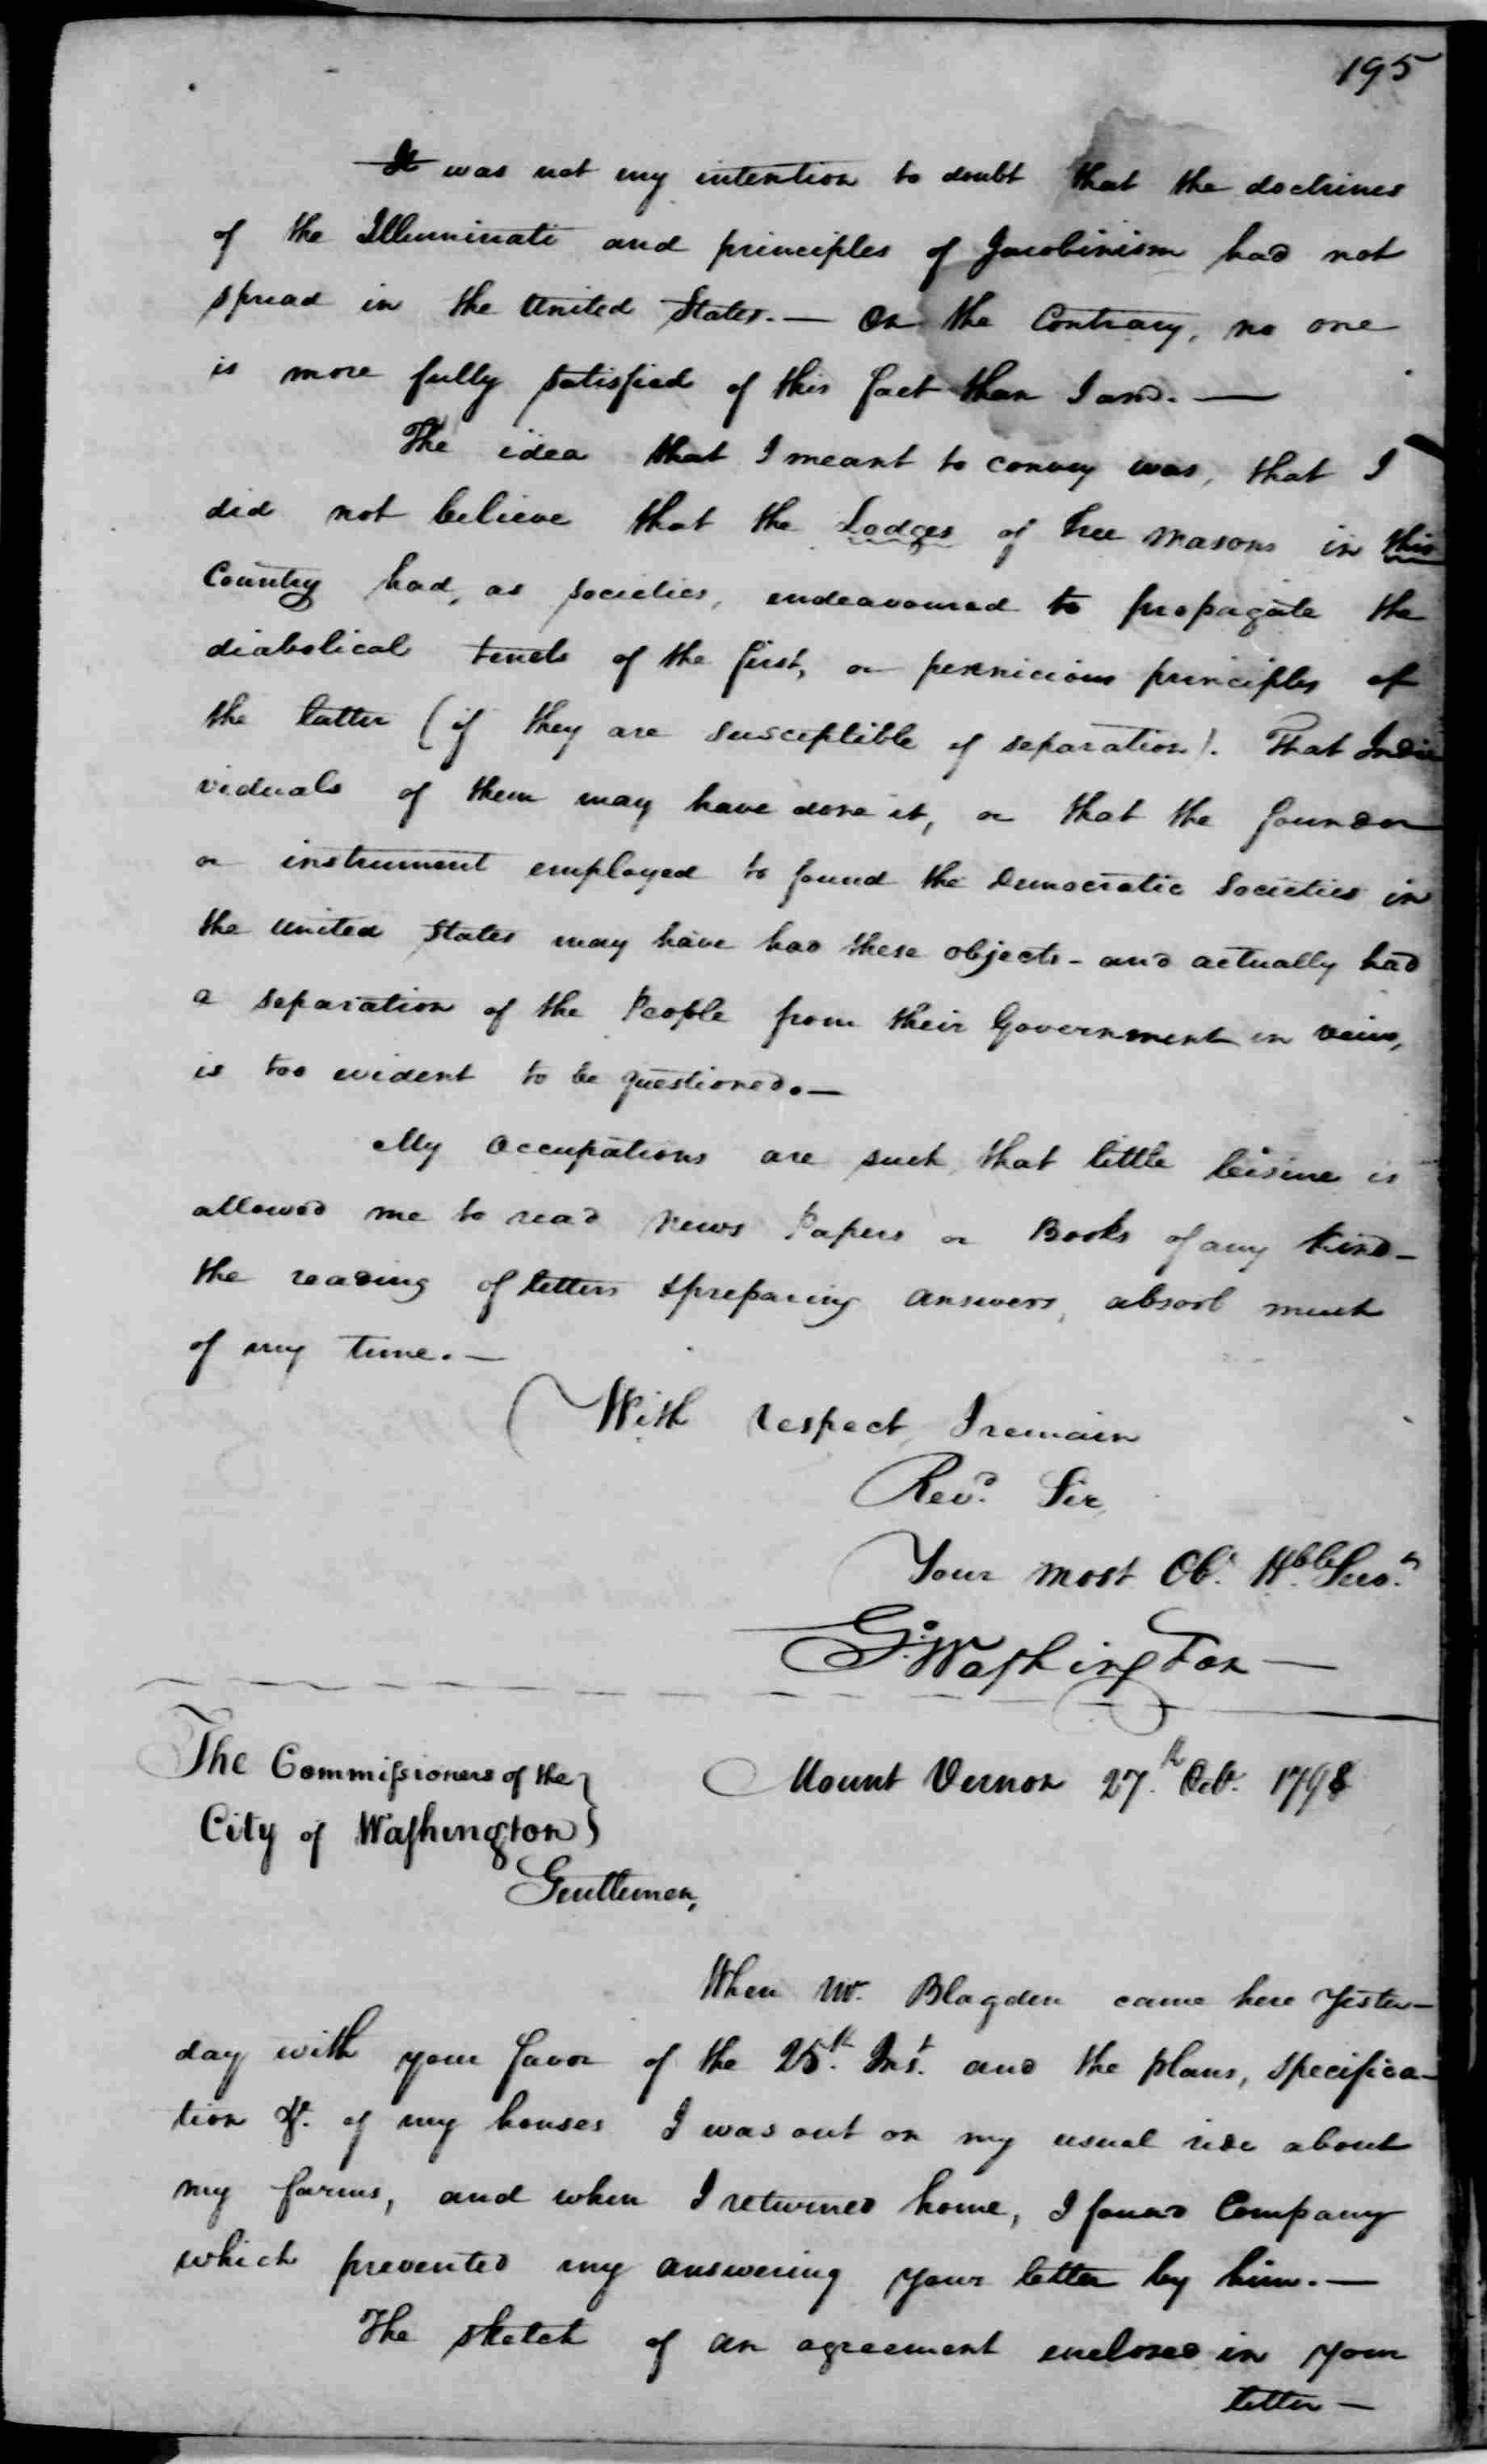 George Washington Illuminati Letter Oct 24th, 1798 - image 2 of 2